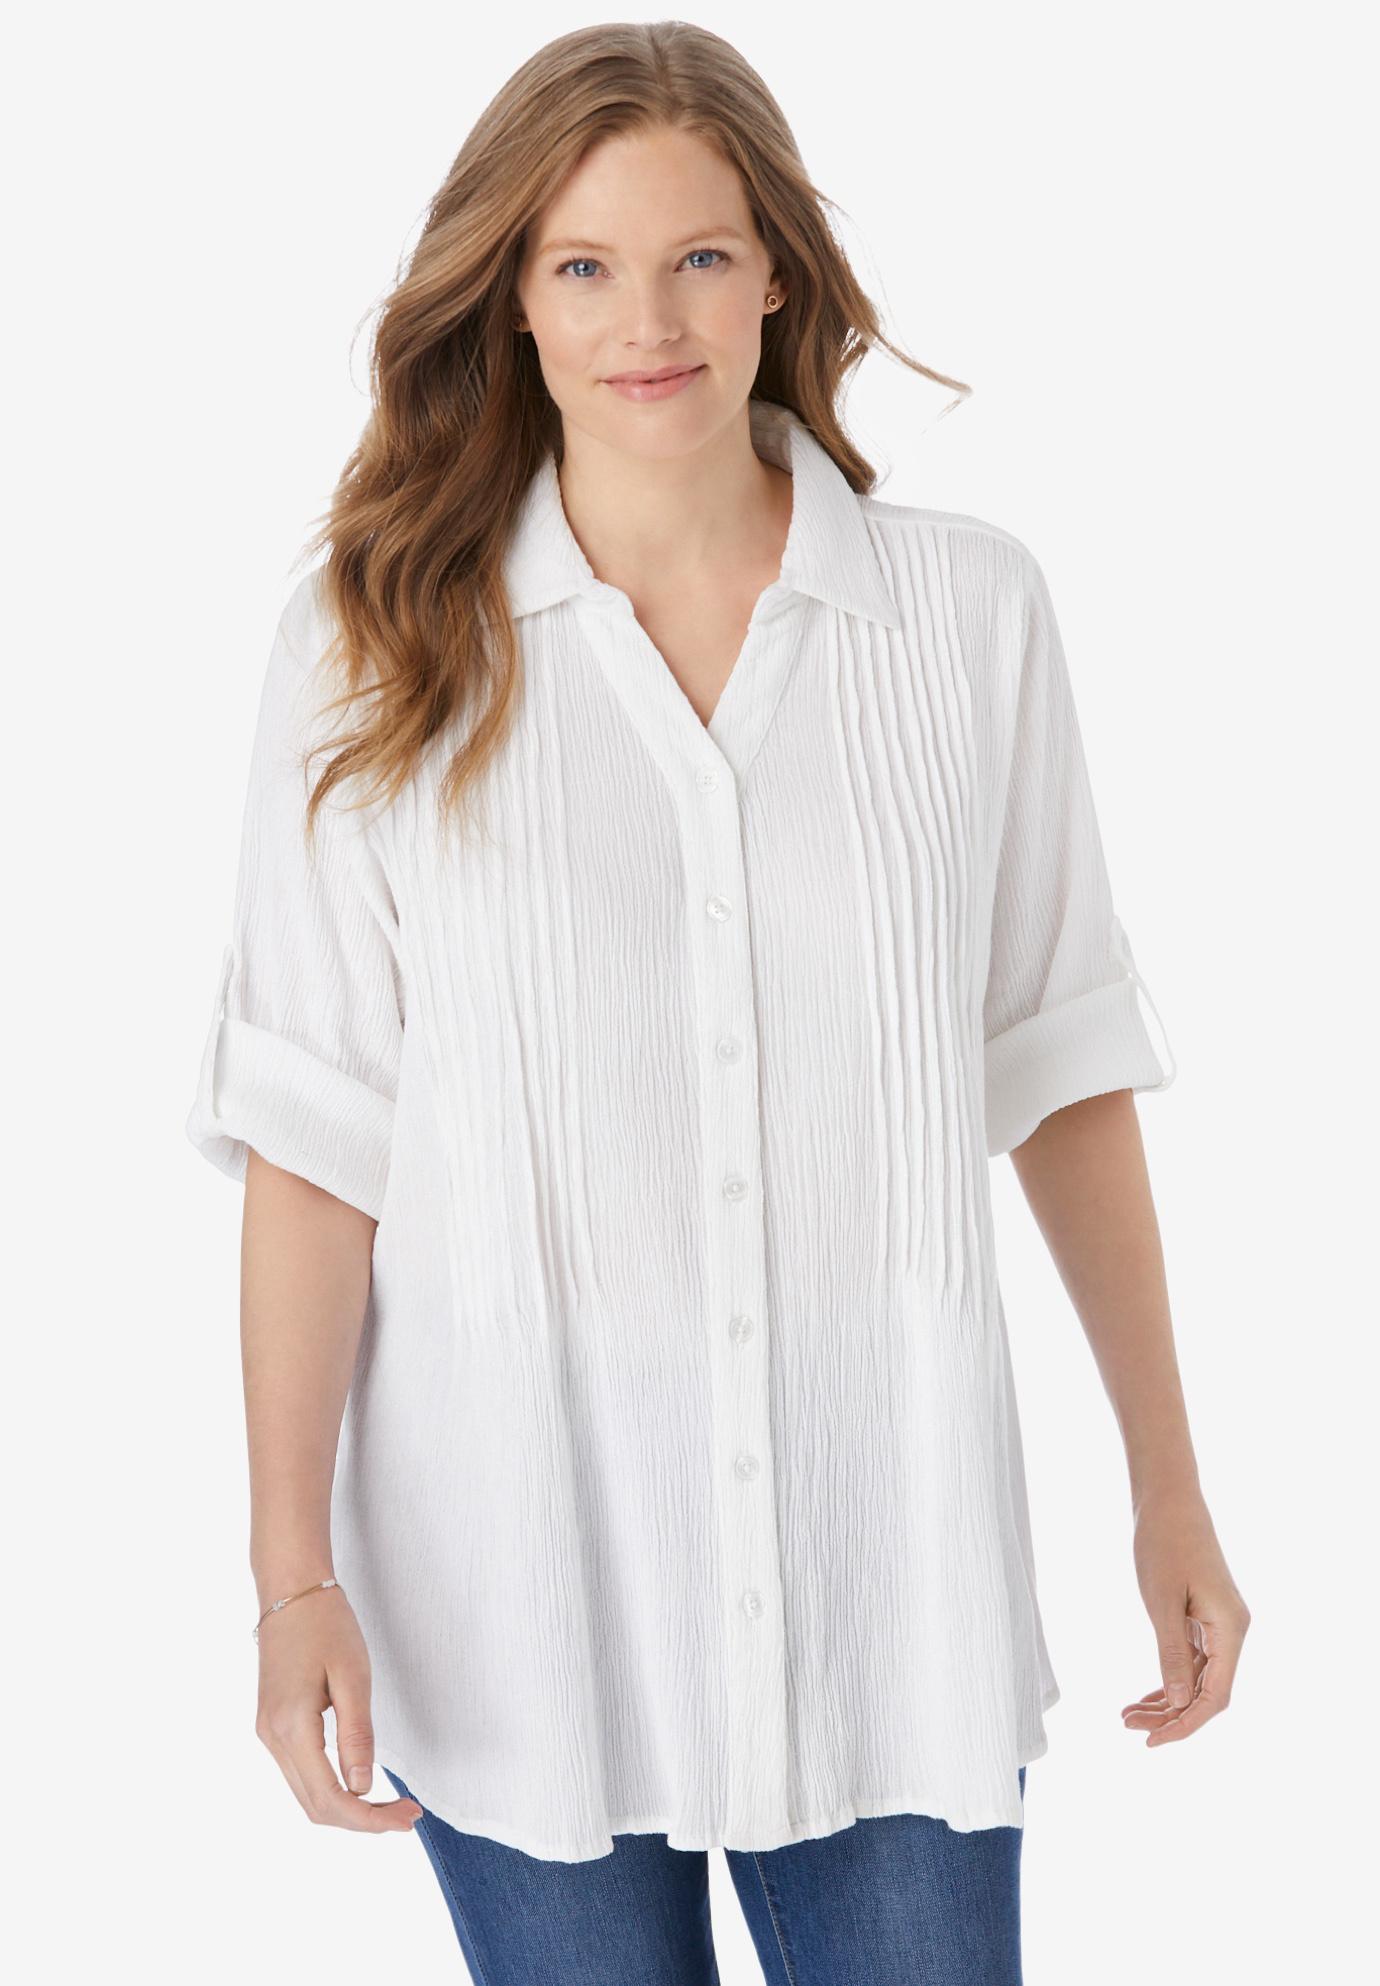 Pintucked Button Down Gauze Shirt Plus Size Shirts Blouses